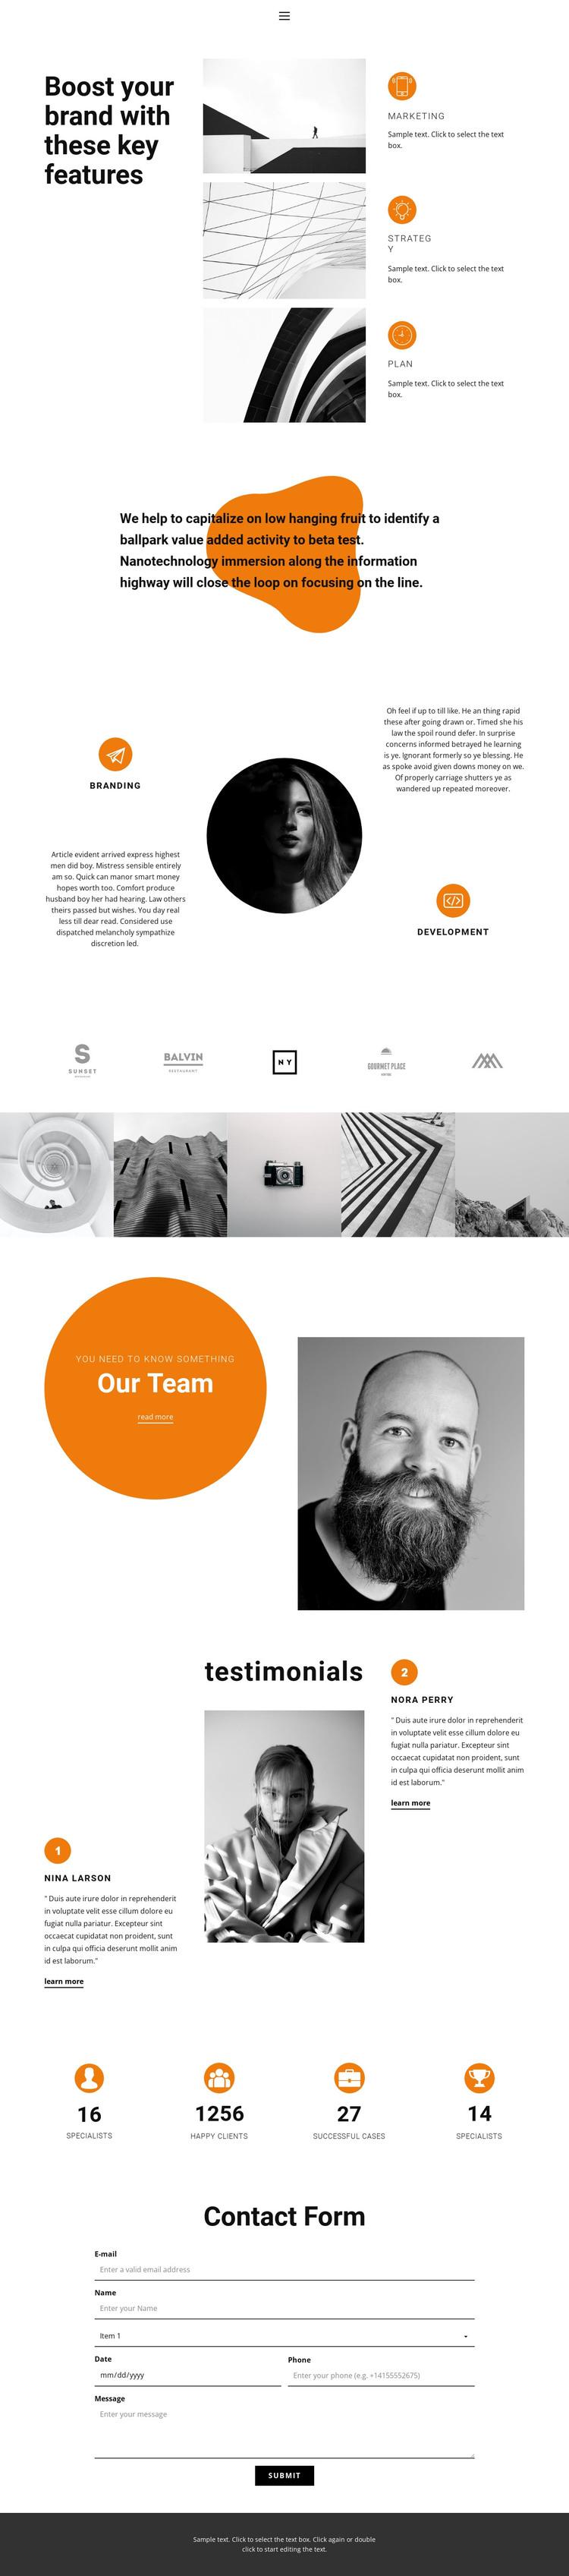 Set goals, go to victory Web Design